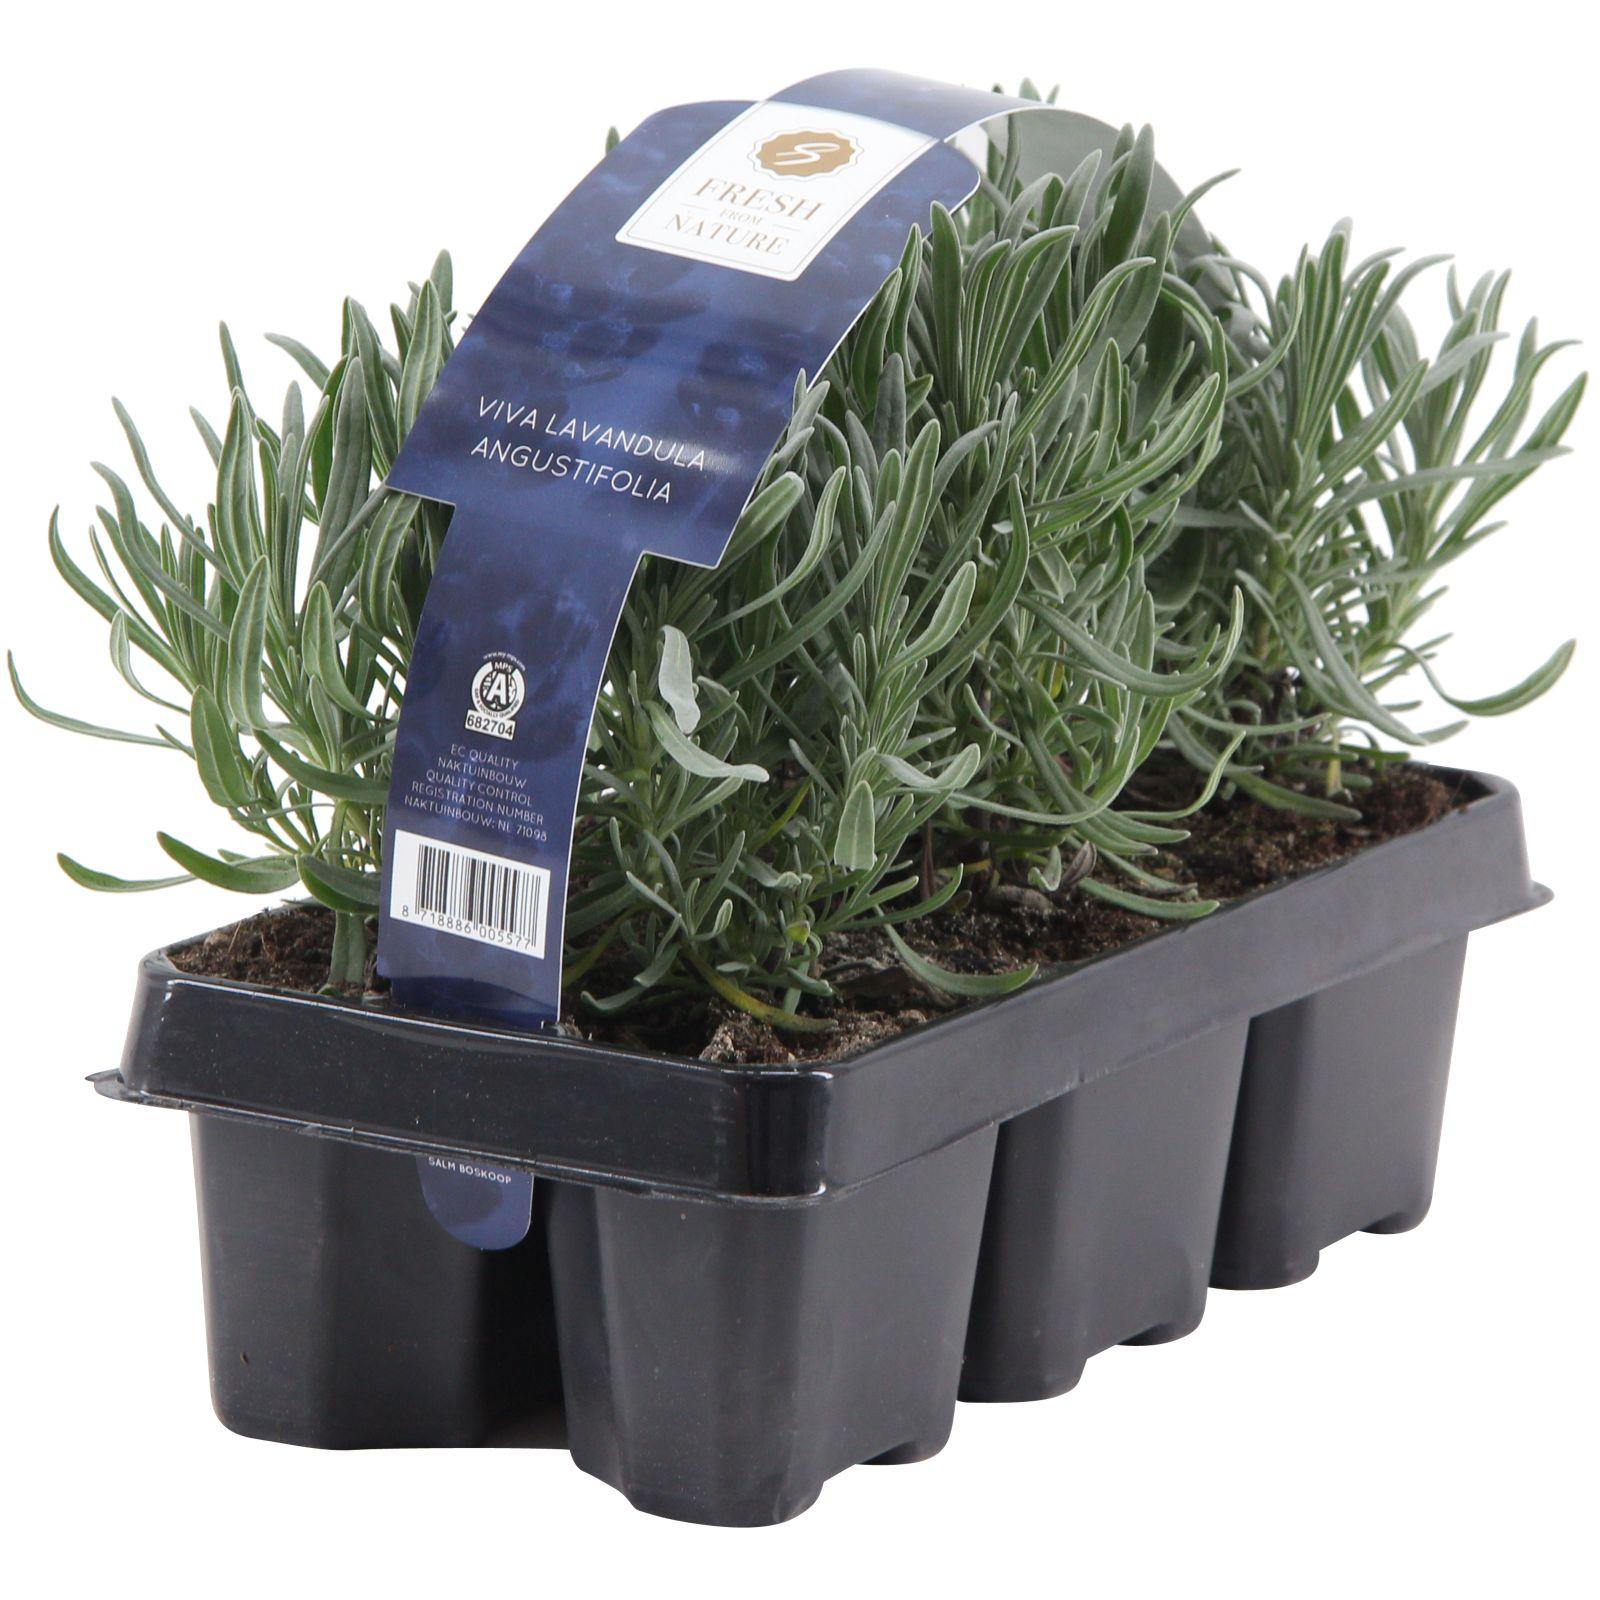 Lavender Hidcote - Buy 1 Get 1 Free instore £4 @ Homebase